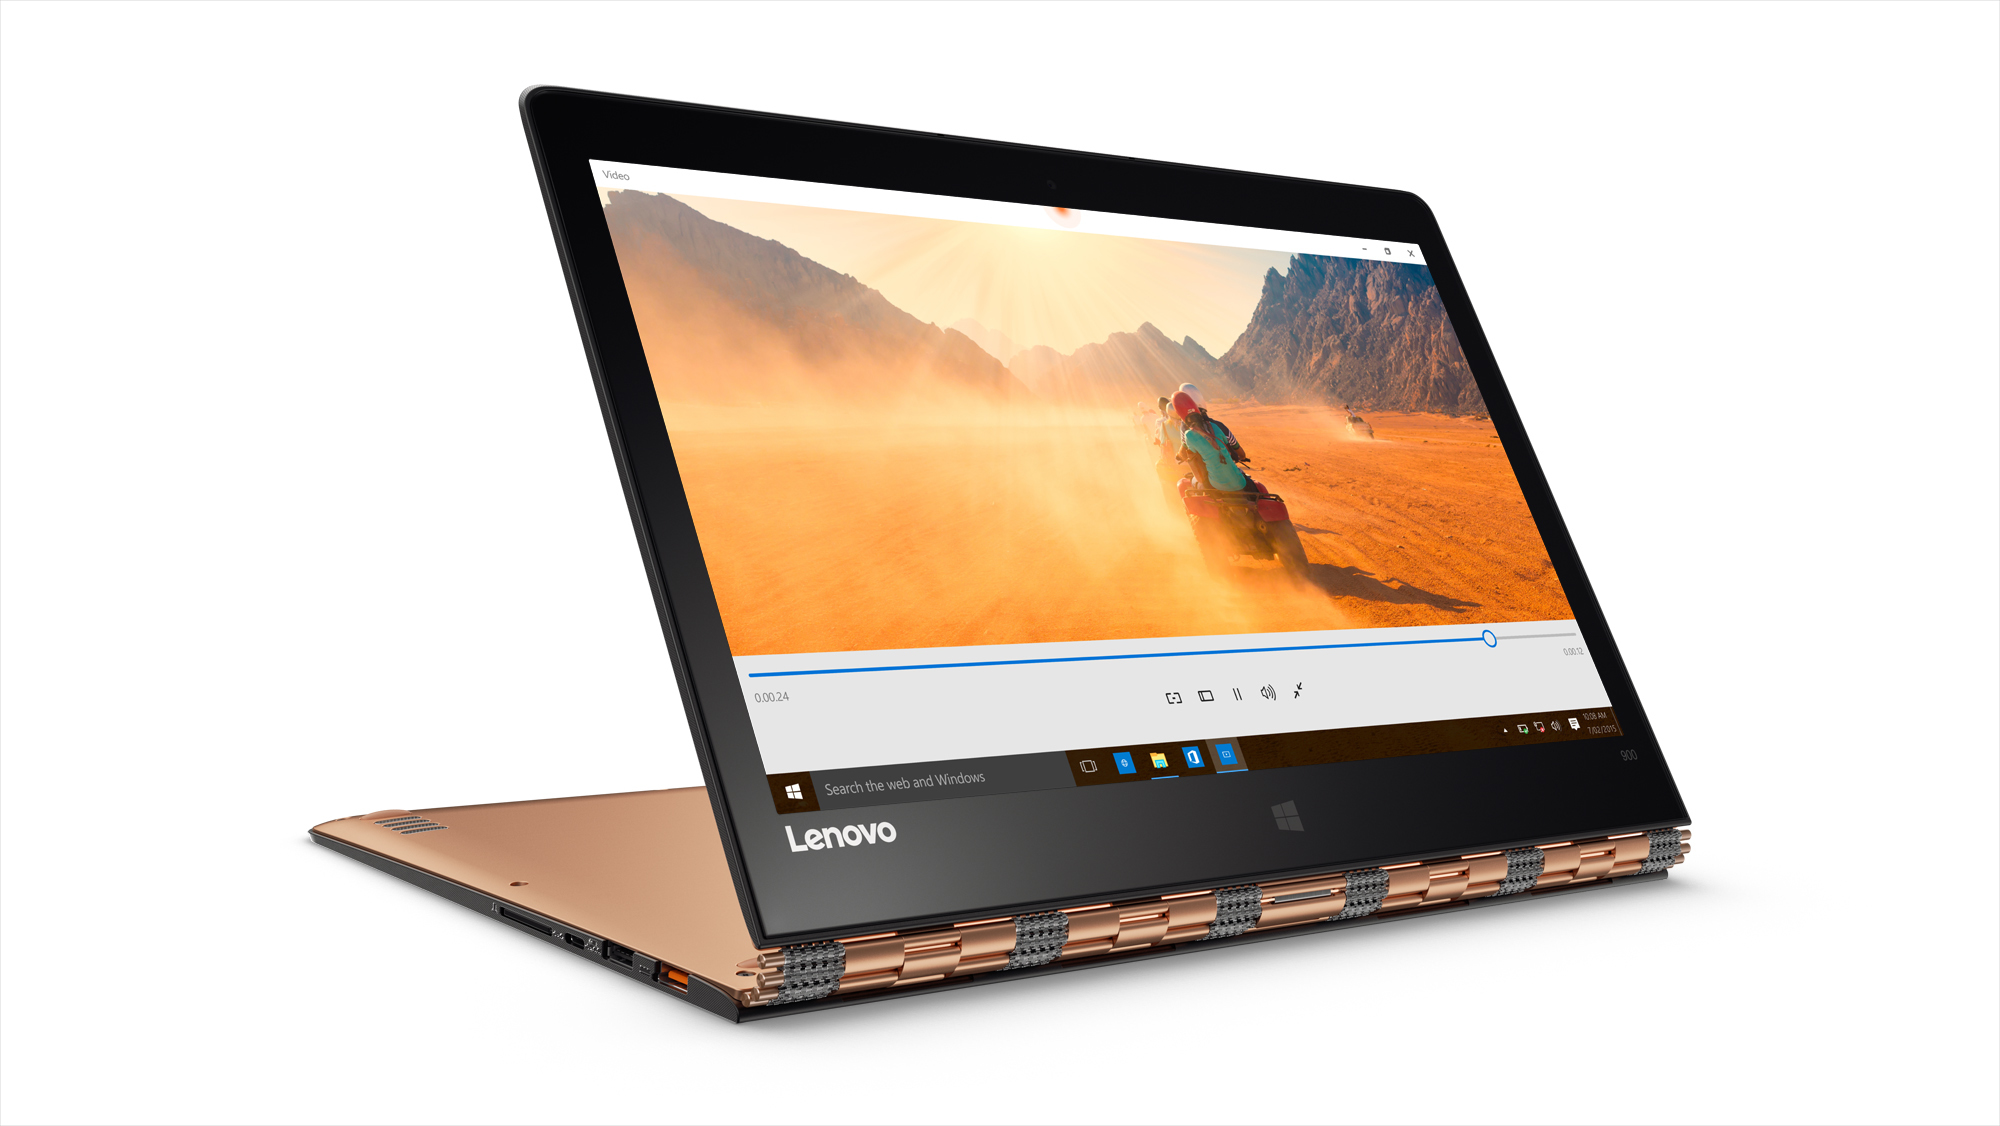 "Lenovo IdeaPad Yoga 900 13 2.4GHz i5-6300U 13.3"" 3200 x 1800pixels Touchscreen Champagne,Gold"